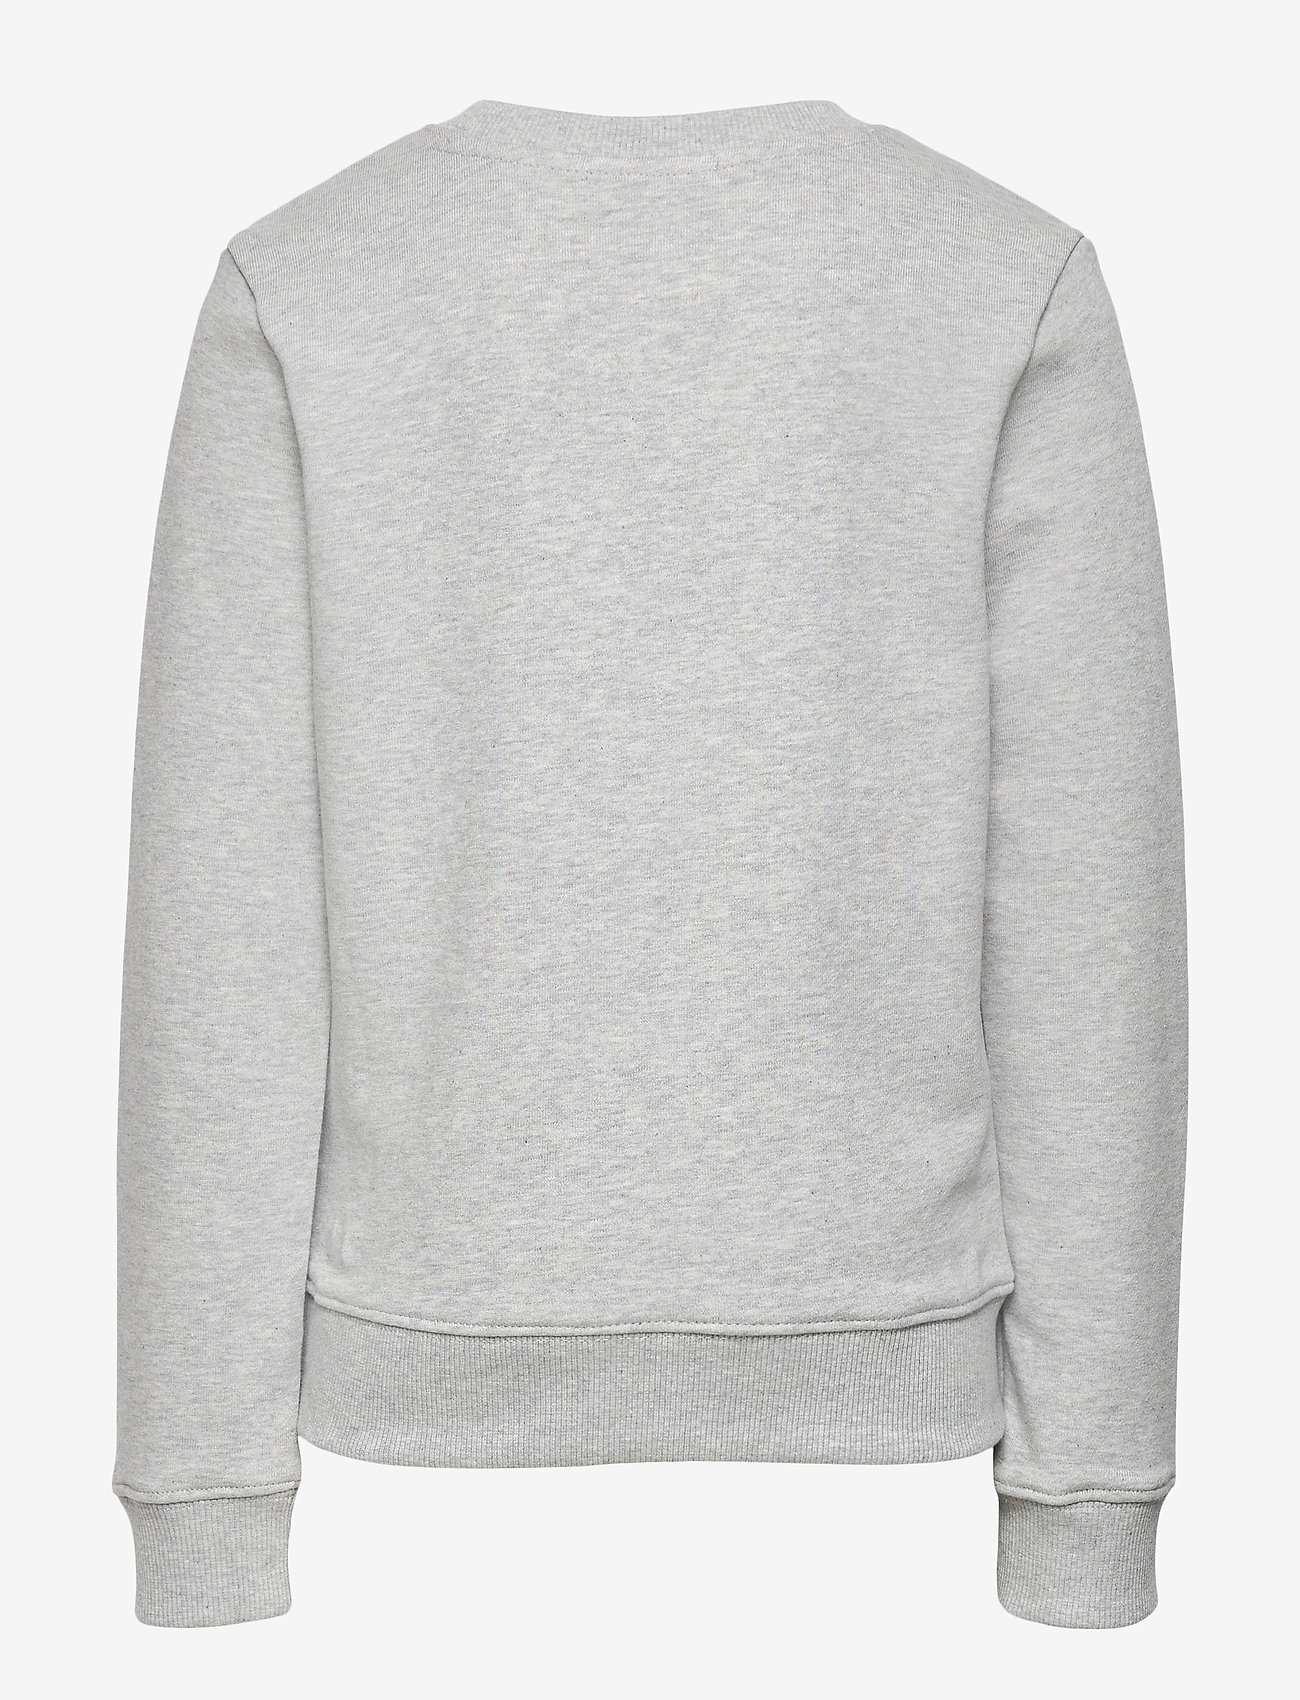 Calvin Klein - REFLECTIVE LOGO SWEATSHIRT - sweatshirts - light grey heather - 1